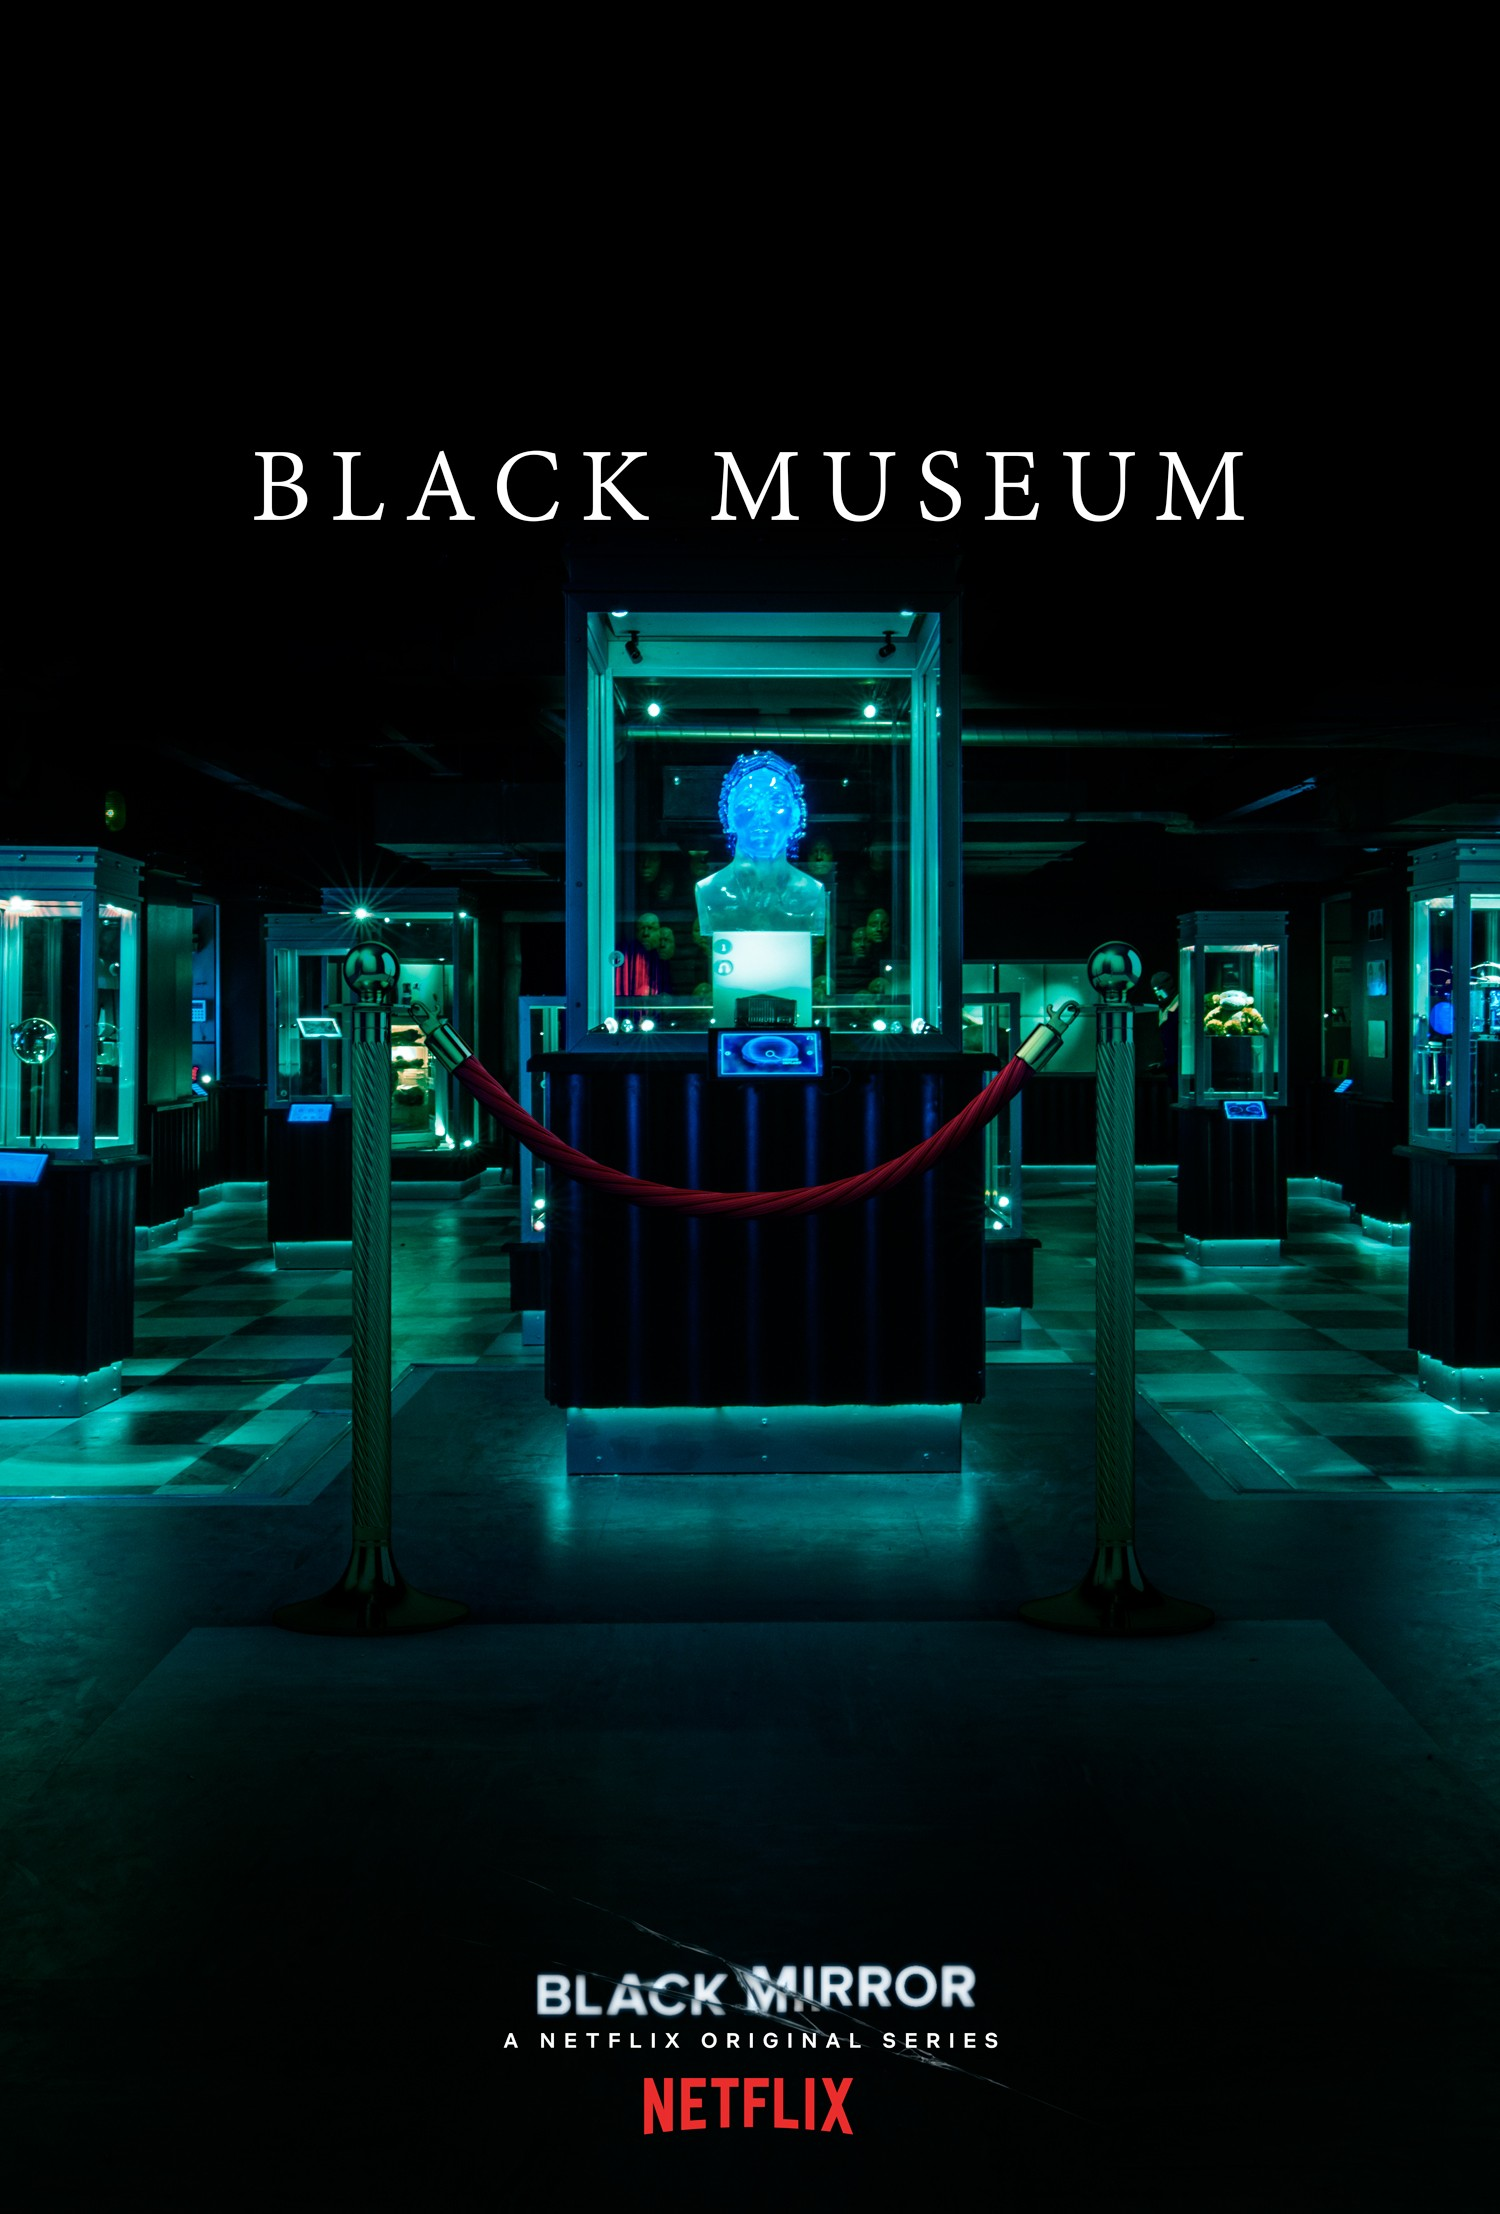 Black Mirror Black Museum (Netflix email, EH)